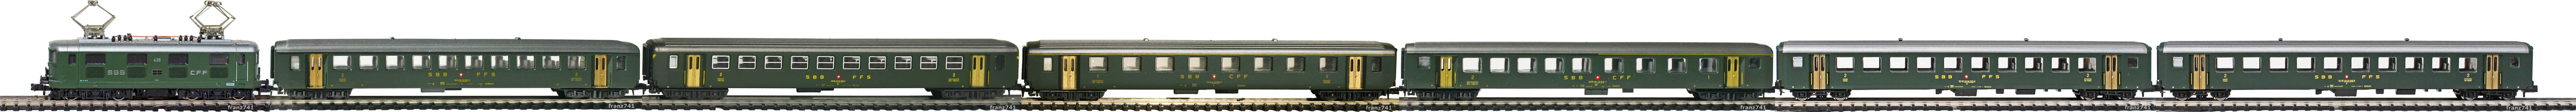 Epoche-III-SBB-Personenzug_Re-4-4-I-Elok-EW-I-EW-II-Wagen-altes-Logo